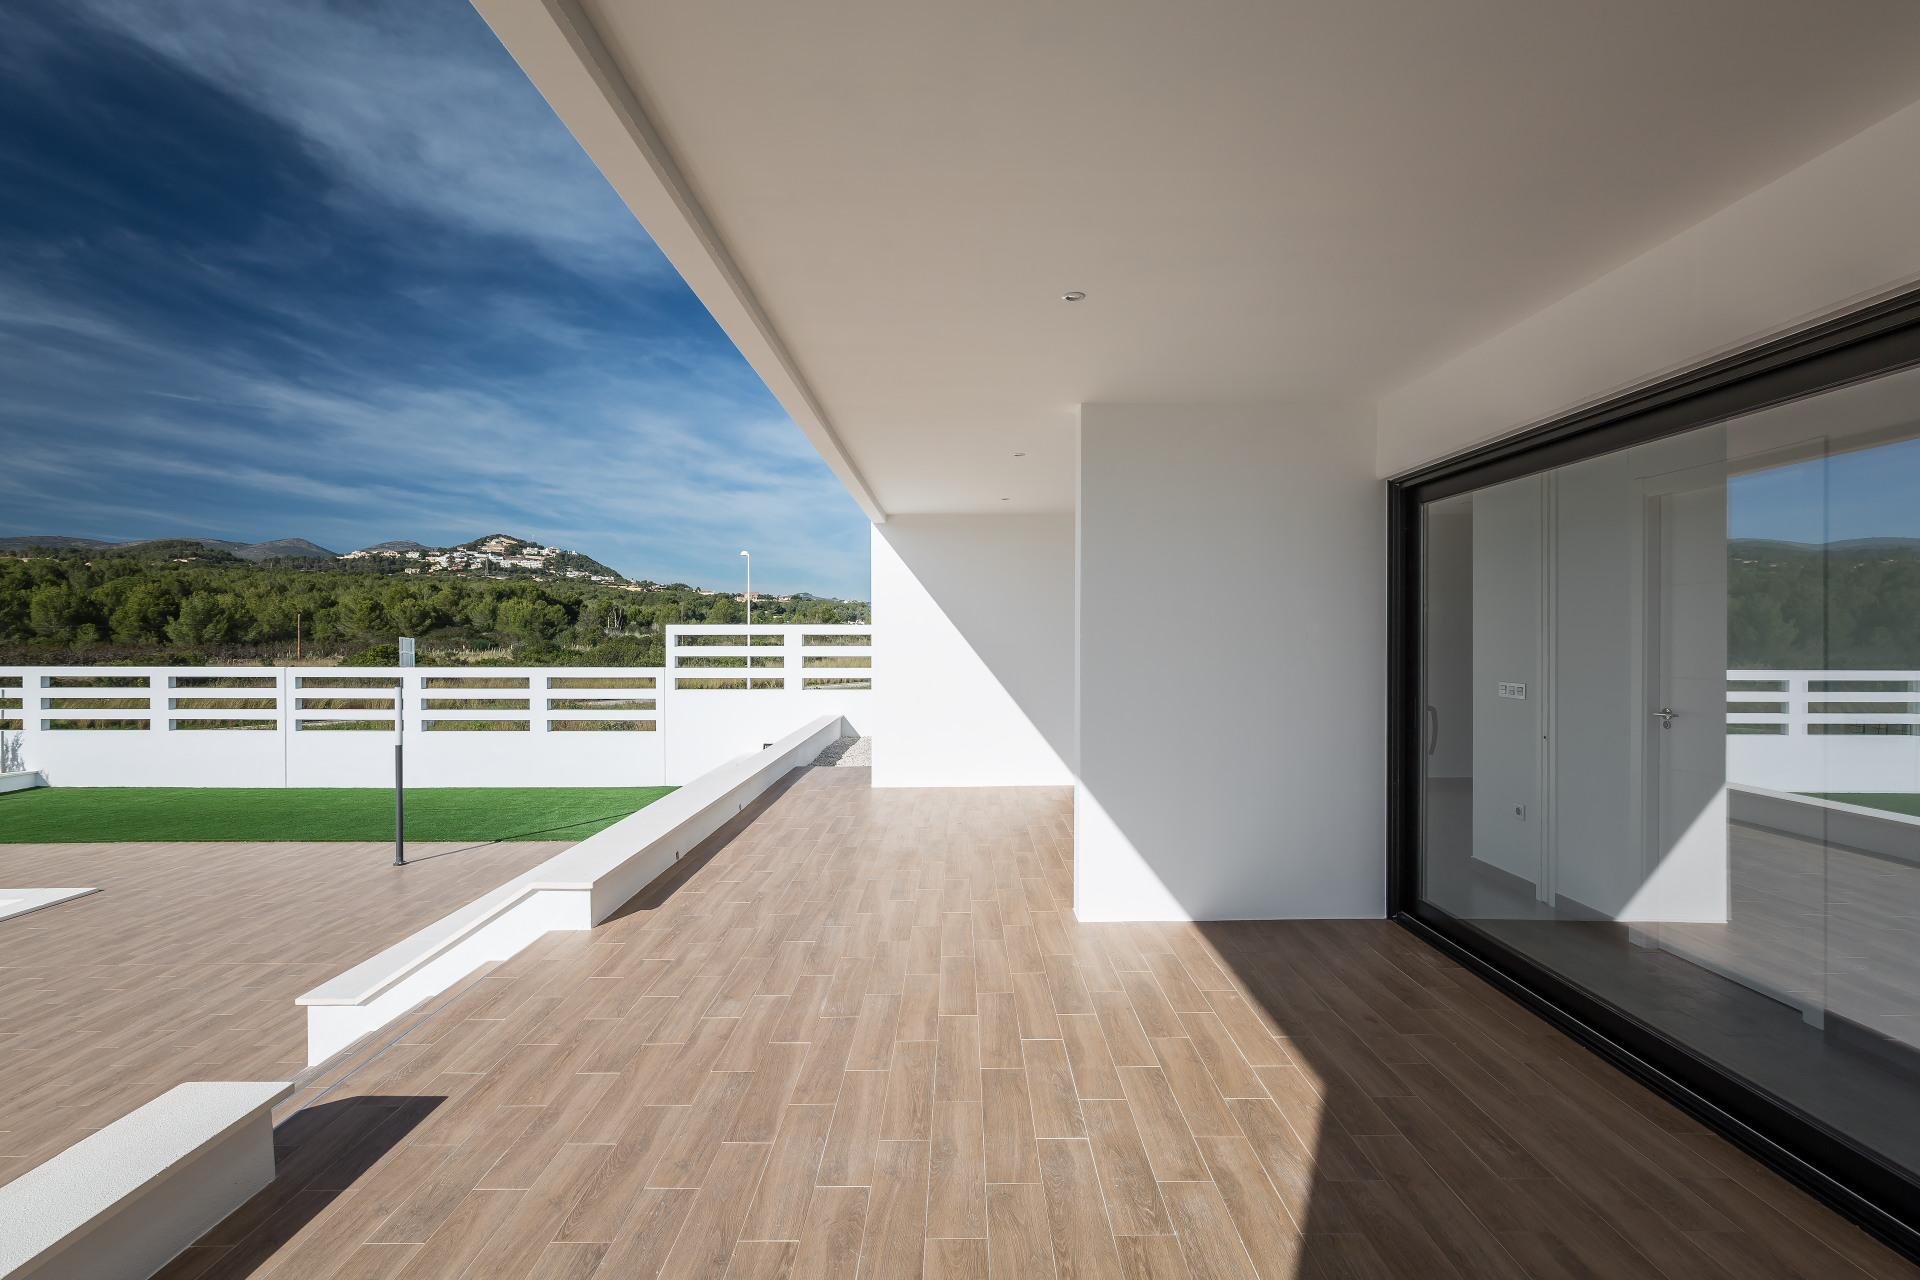 fotografia-arquitectura-valencia-german-cabo-viraje-vivienda-unifamiliar-calpe (24)